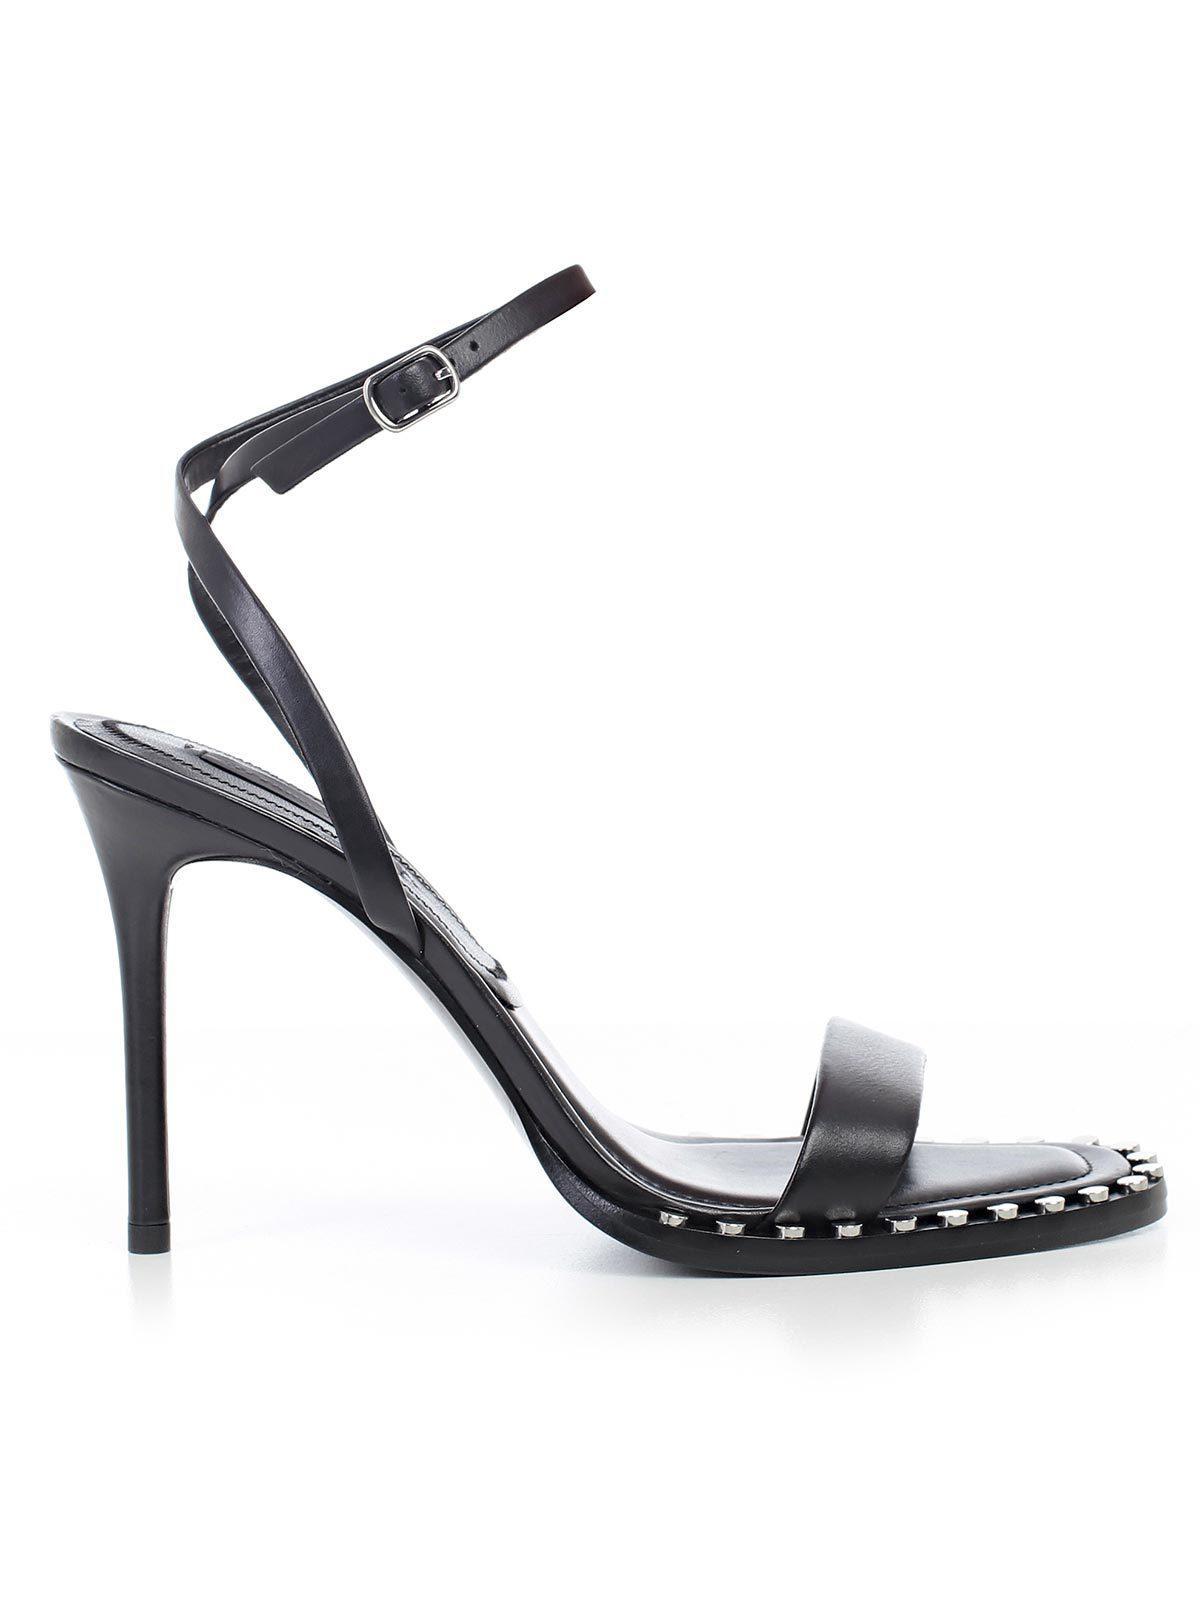 Black Cate Sandals Alexander Wang pxlZ7